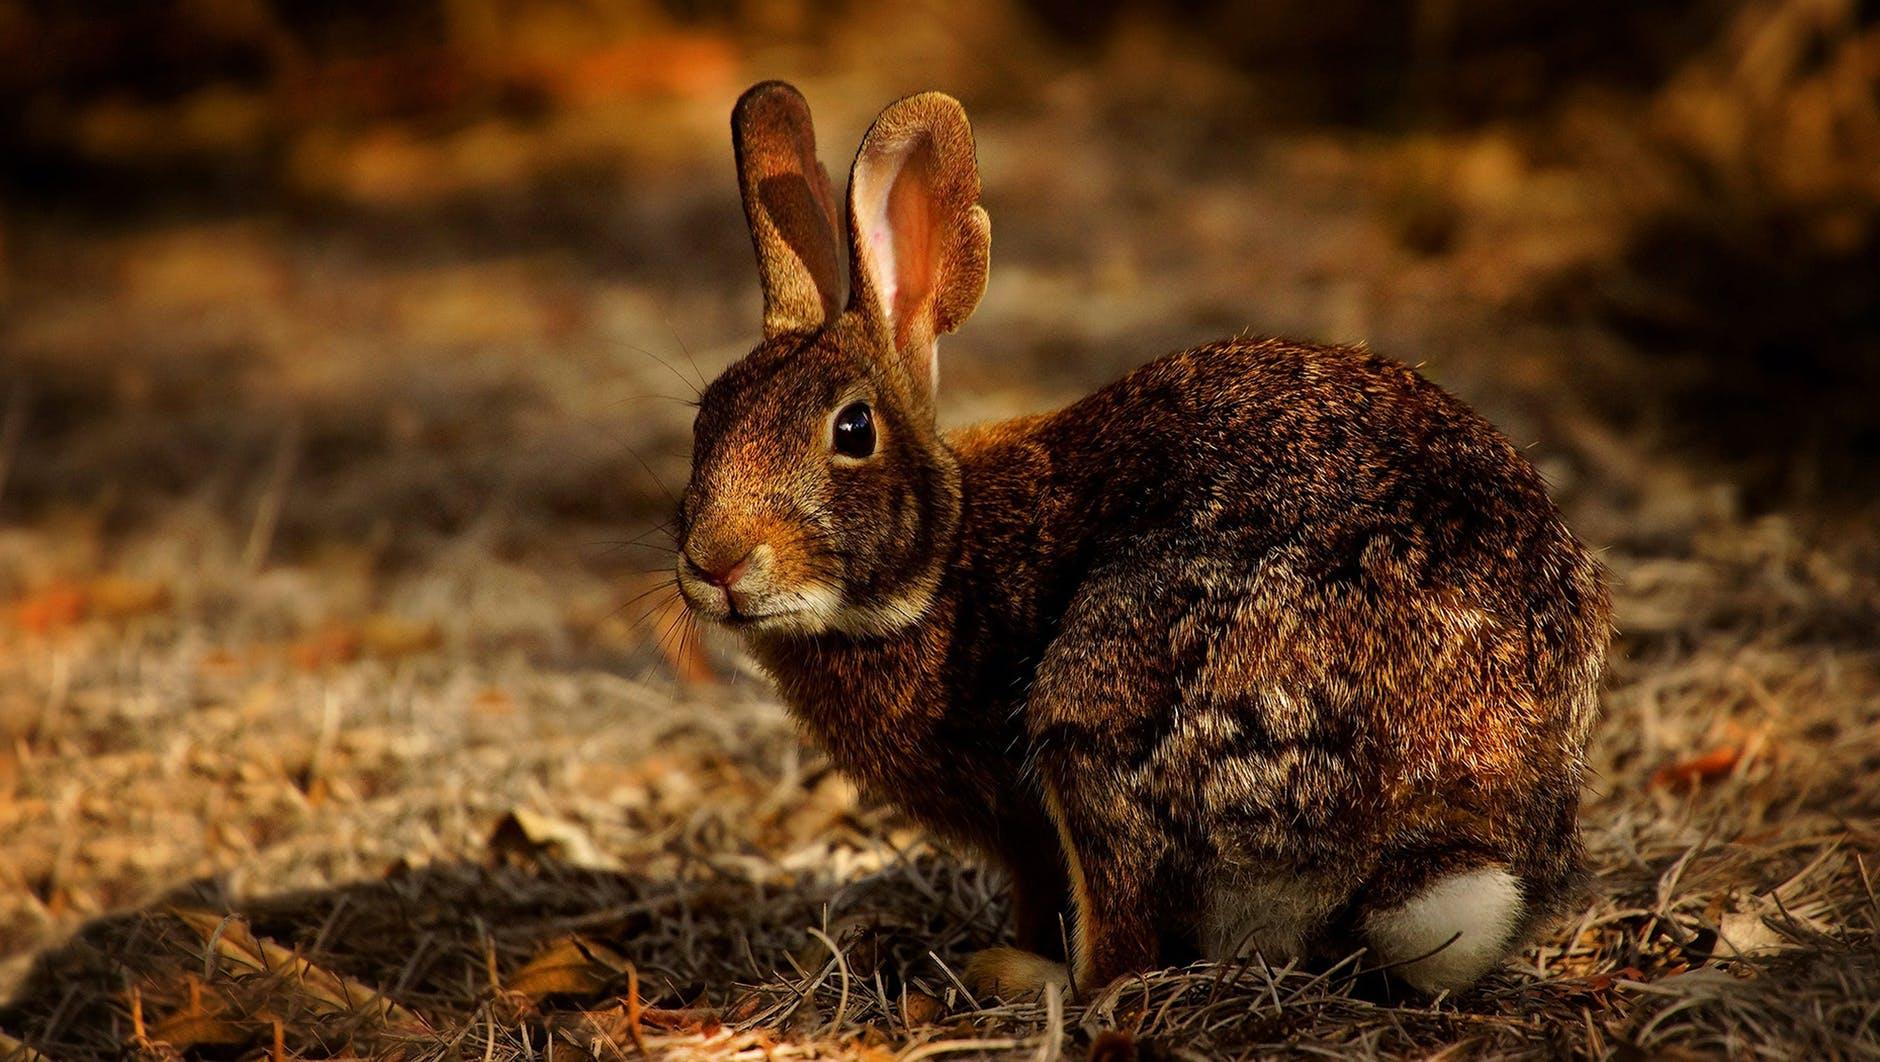 close up photo of rabbit